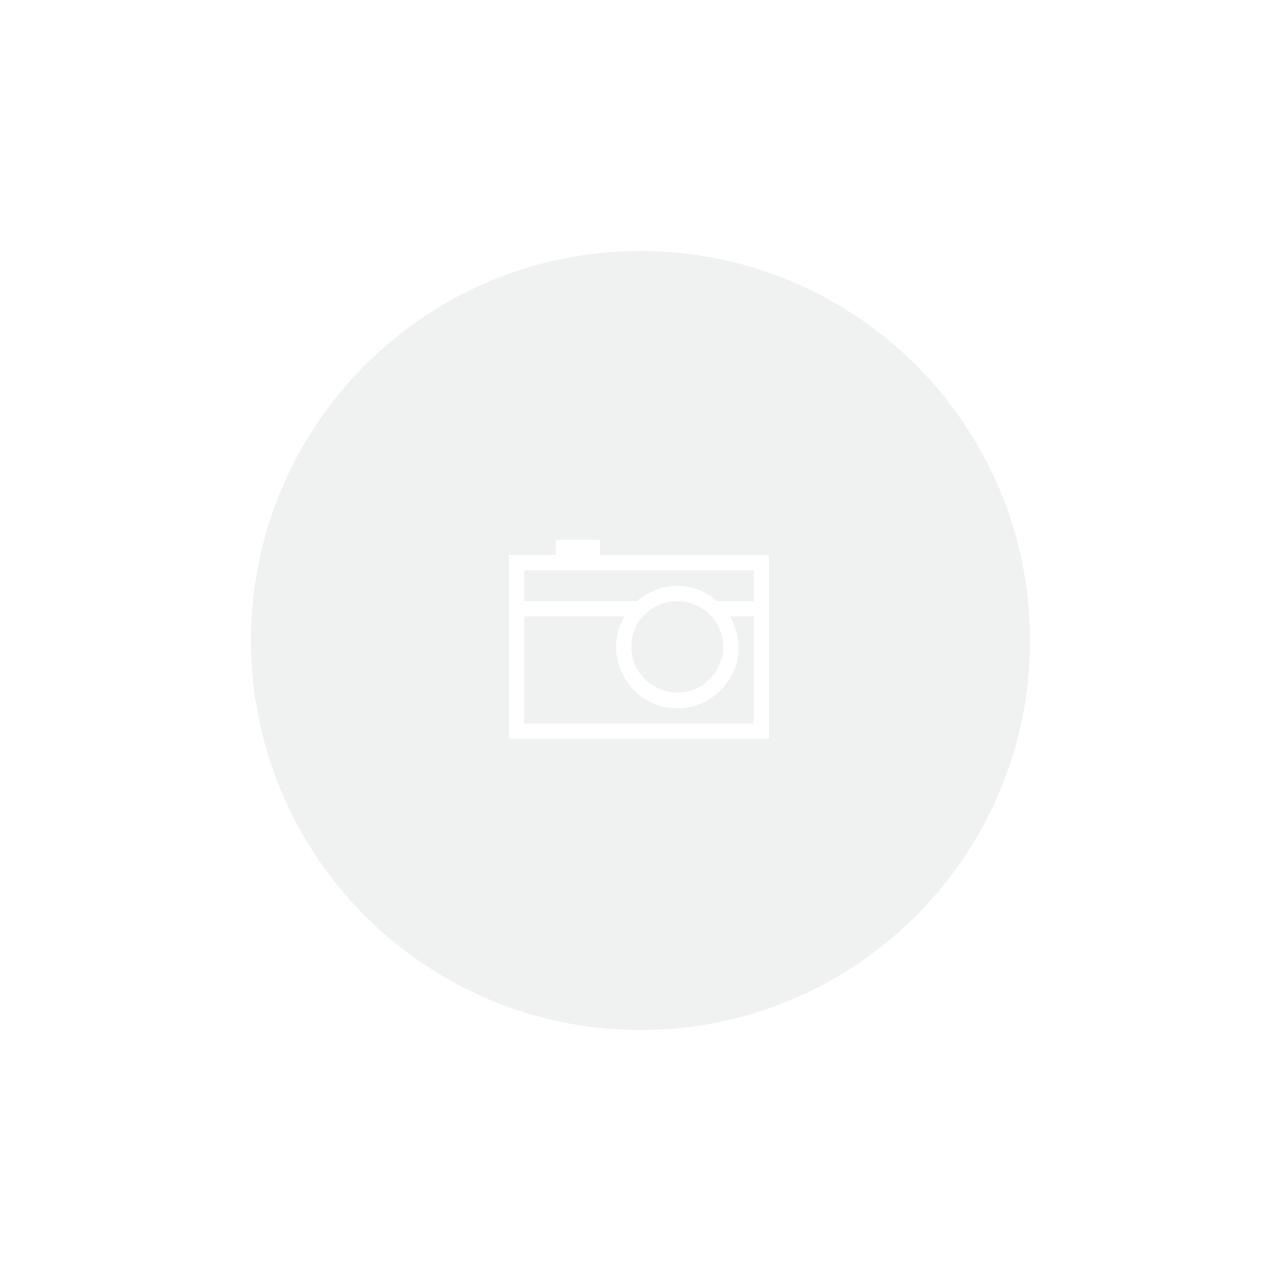 Bistequeira 24cm Starflon Preto Versalhes Tramontina